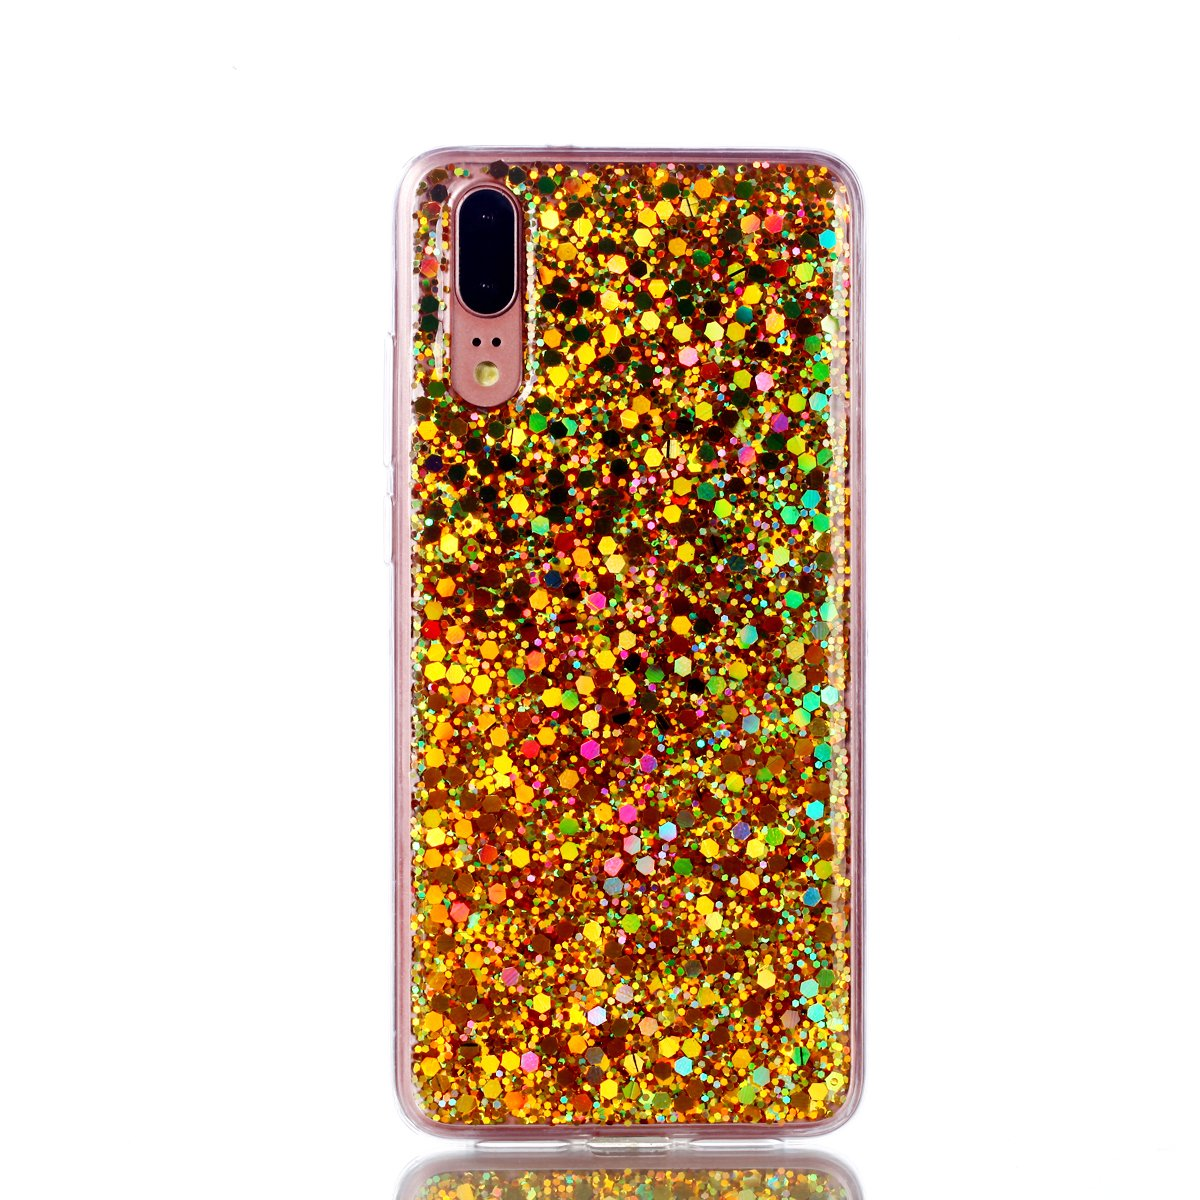 Shinyzone Custodia Huawei P20 Lite,Cover Huawei P20 Lite Bling Brillante Paillettes Design Copertura Protettiva TPU Gel Morbida-Viola